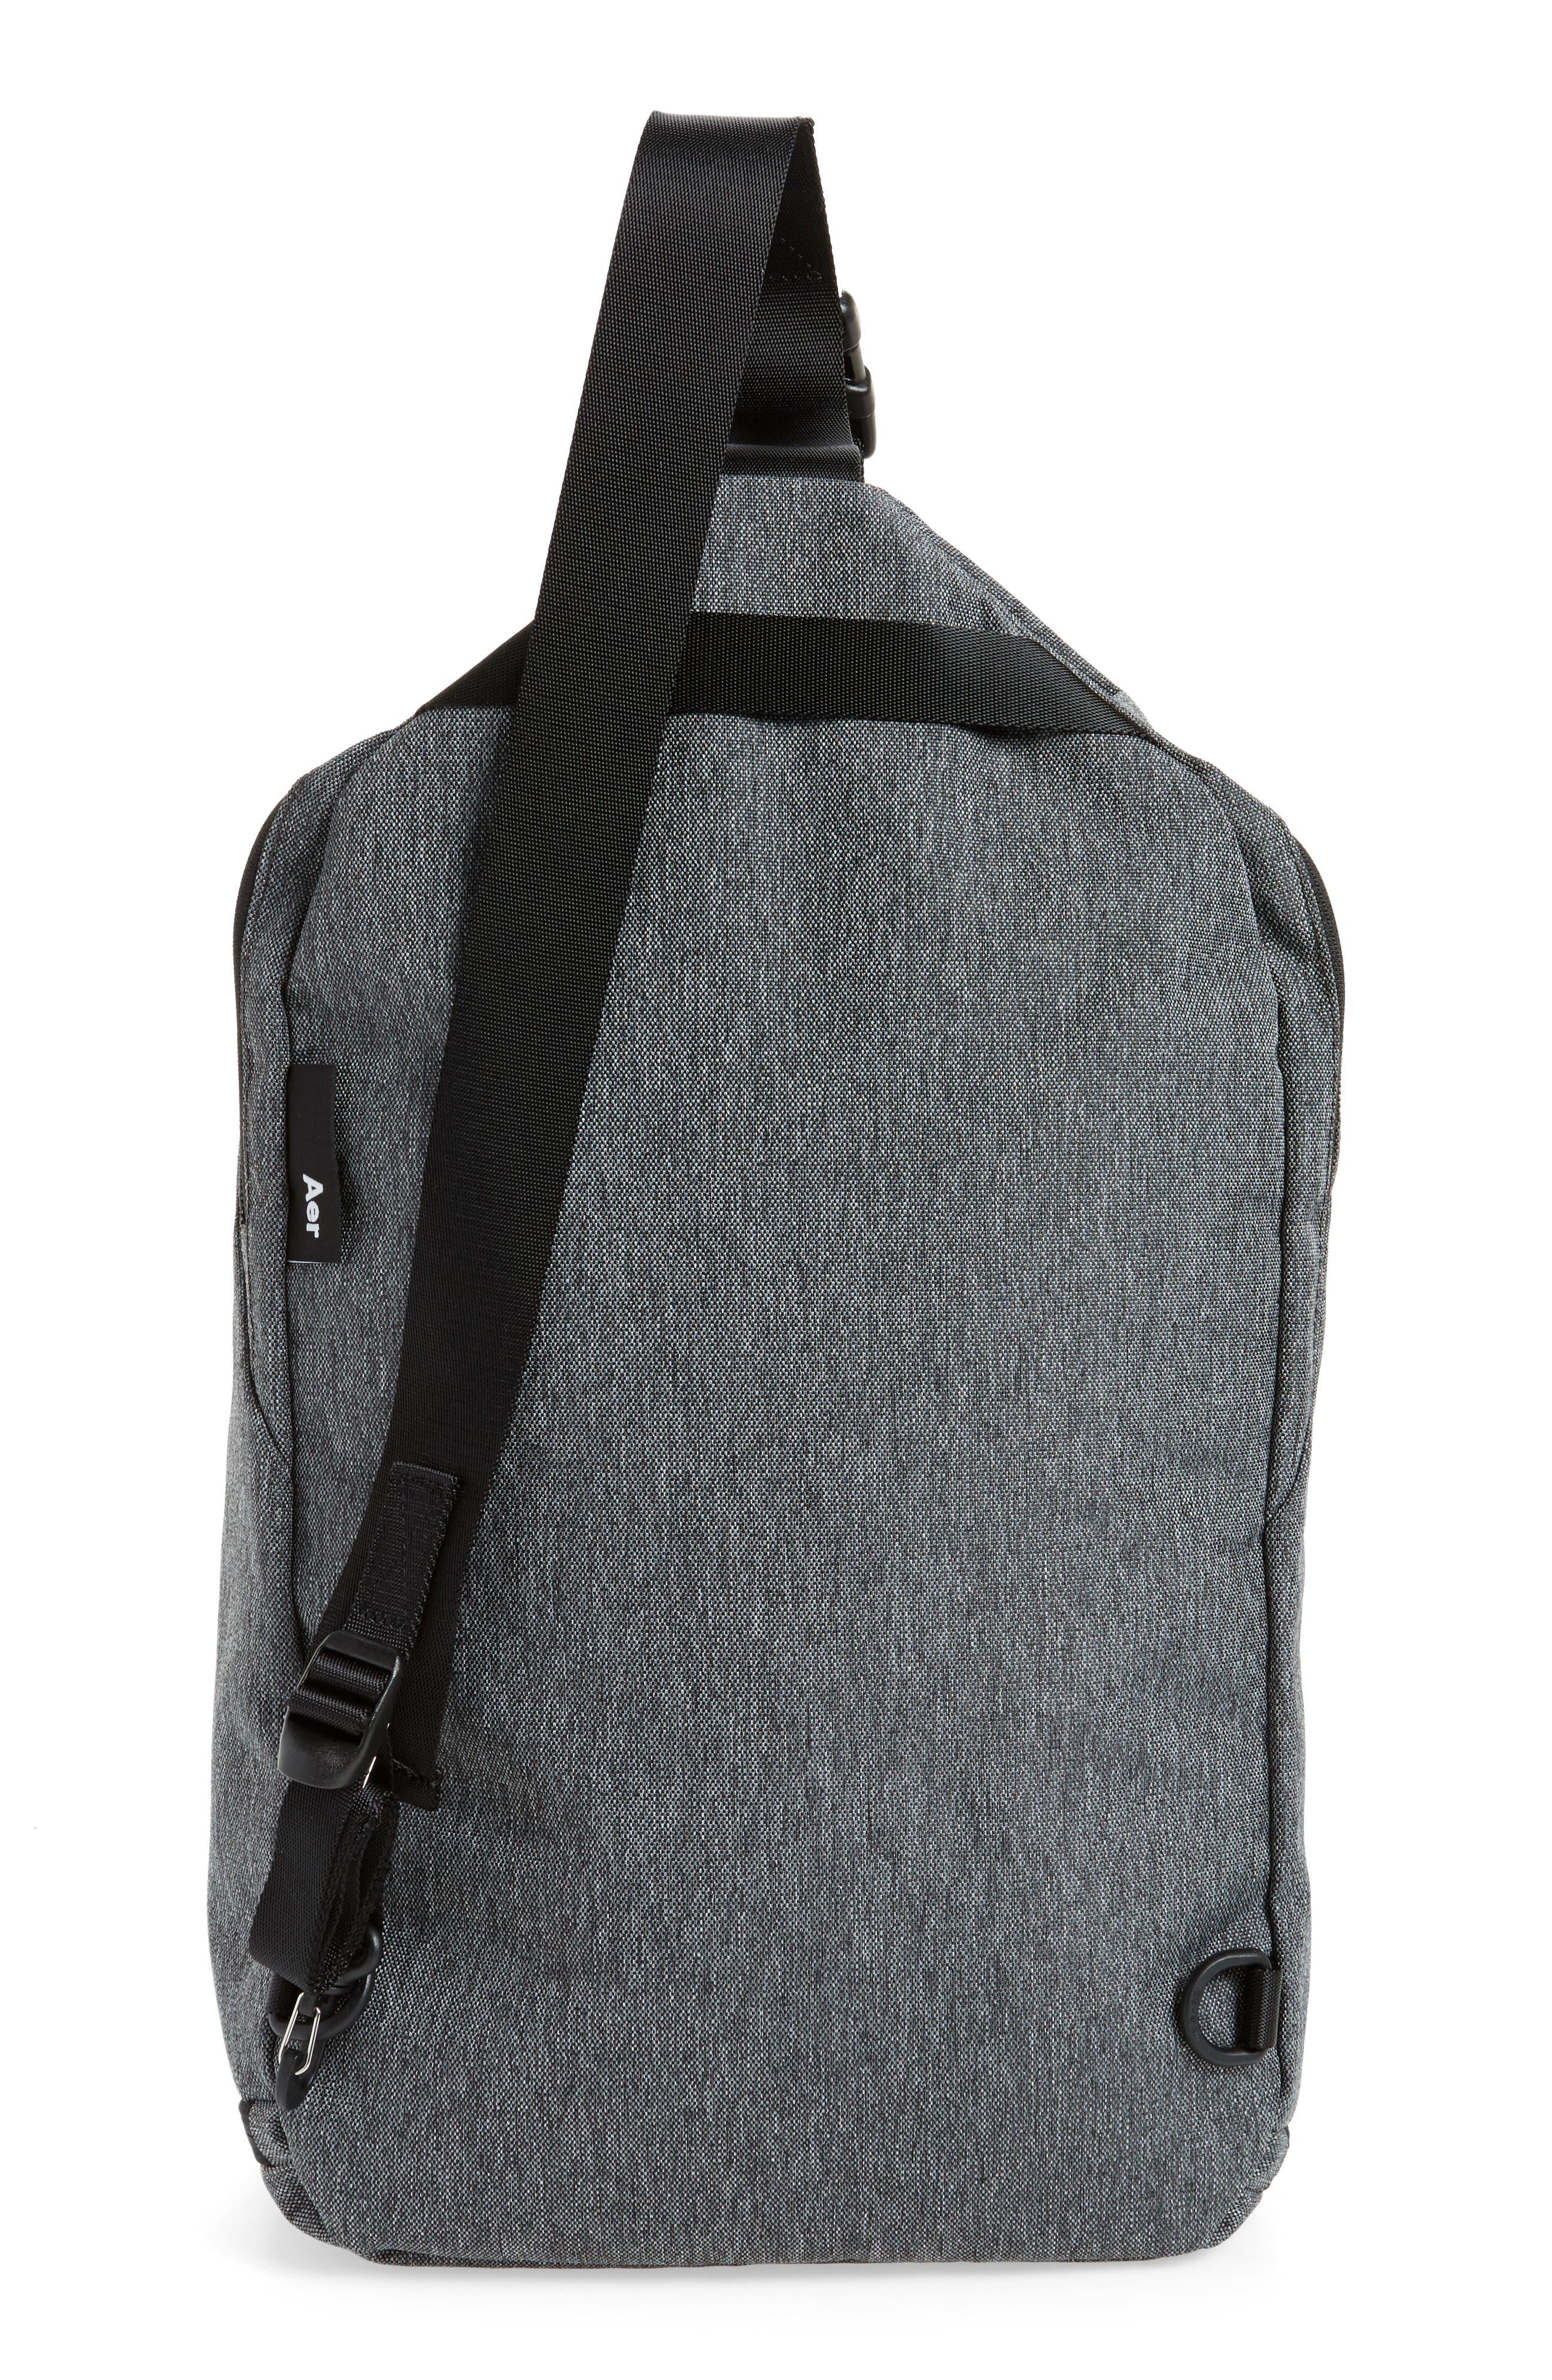 Alternate Image 3  - Aer Sling Bag 2 Sling